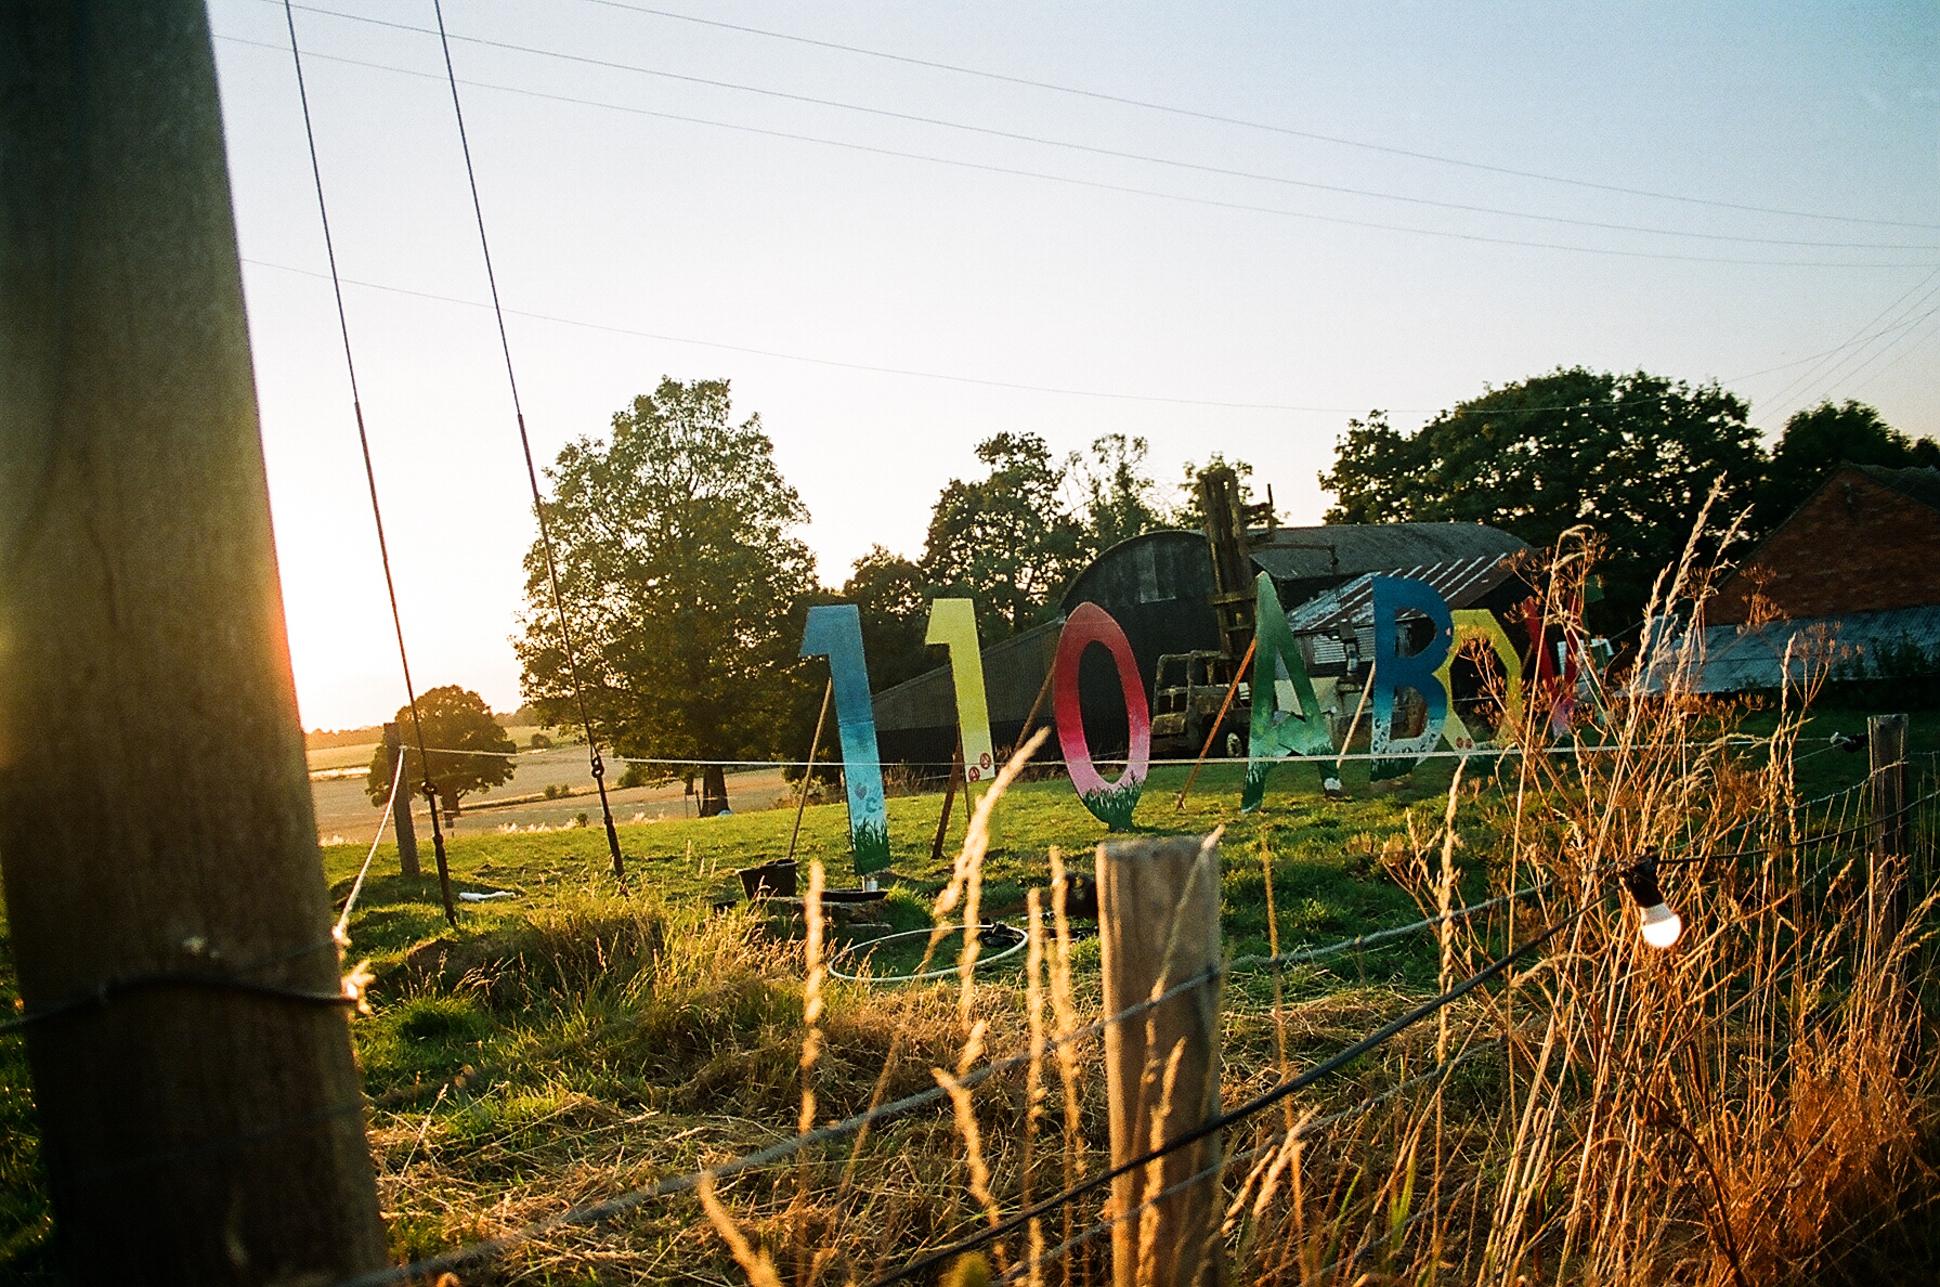 110 Above Festival - August 2018 - 35mm - Ant Adams-23.jpg